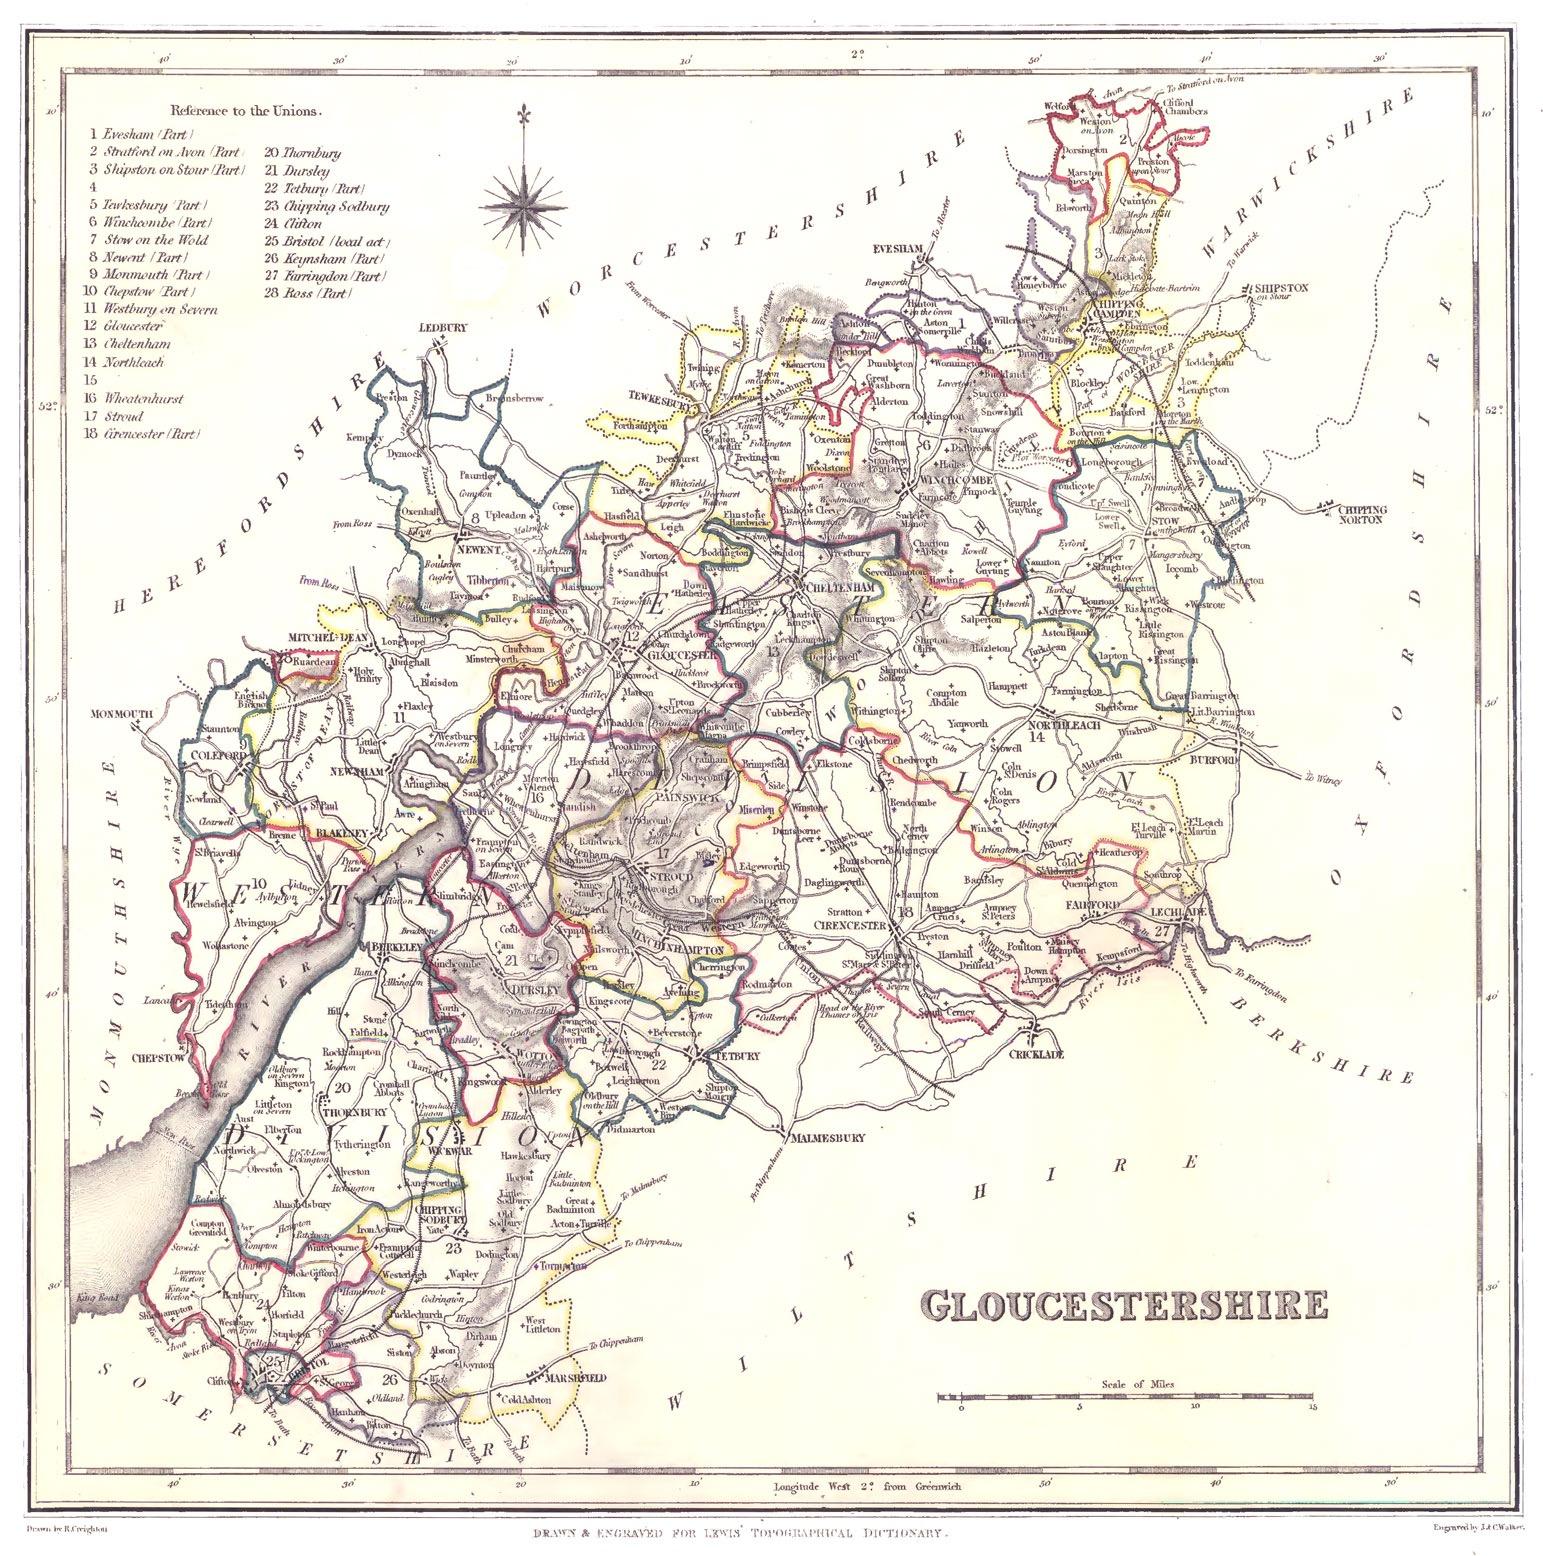 Gloucestershire genealogy heraldry and family history